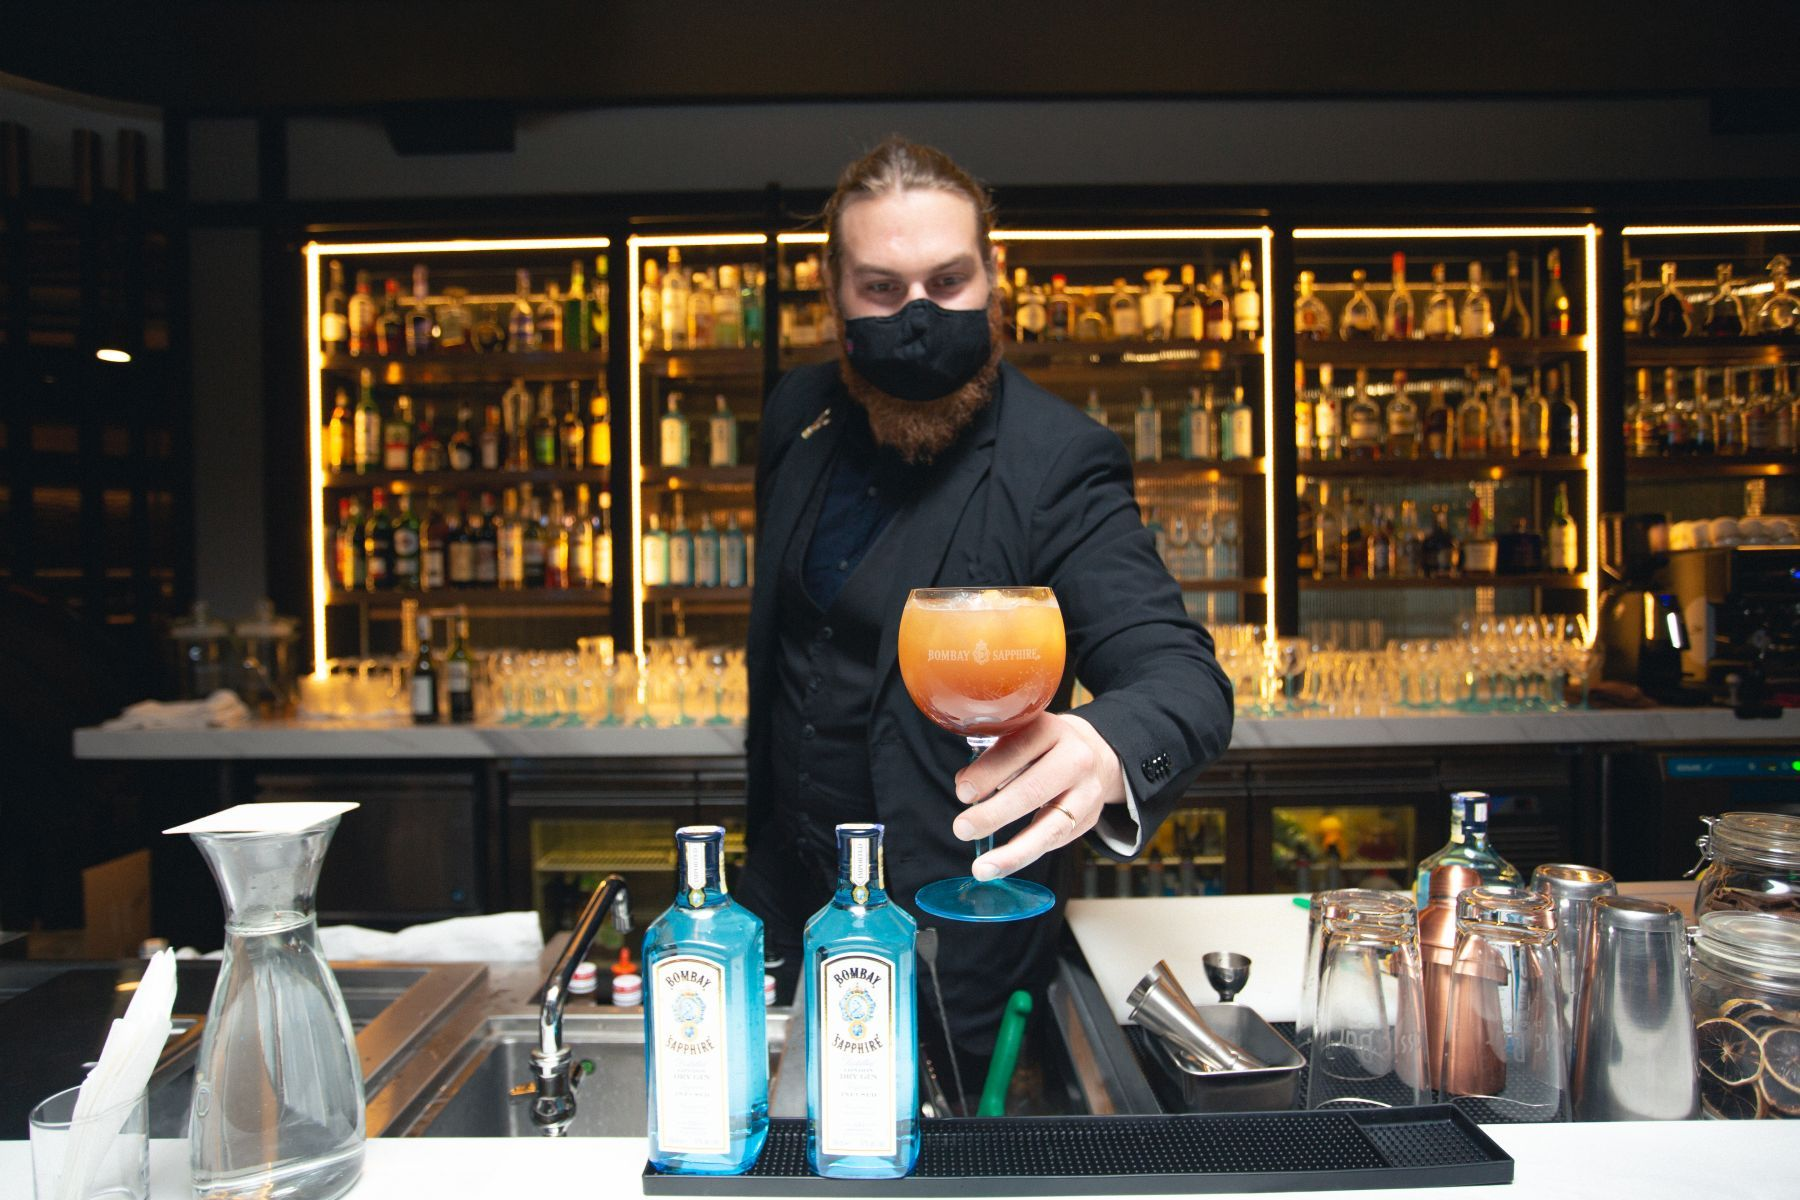 Mixologist Jonas Ax mixing a Bomaby Sapphire Gin.